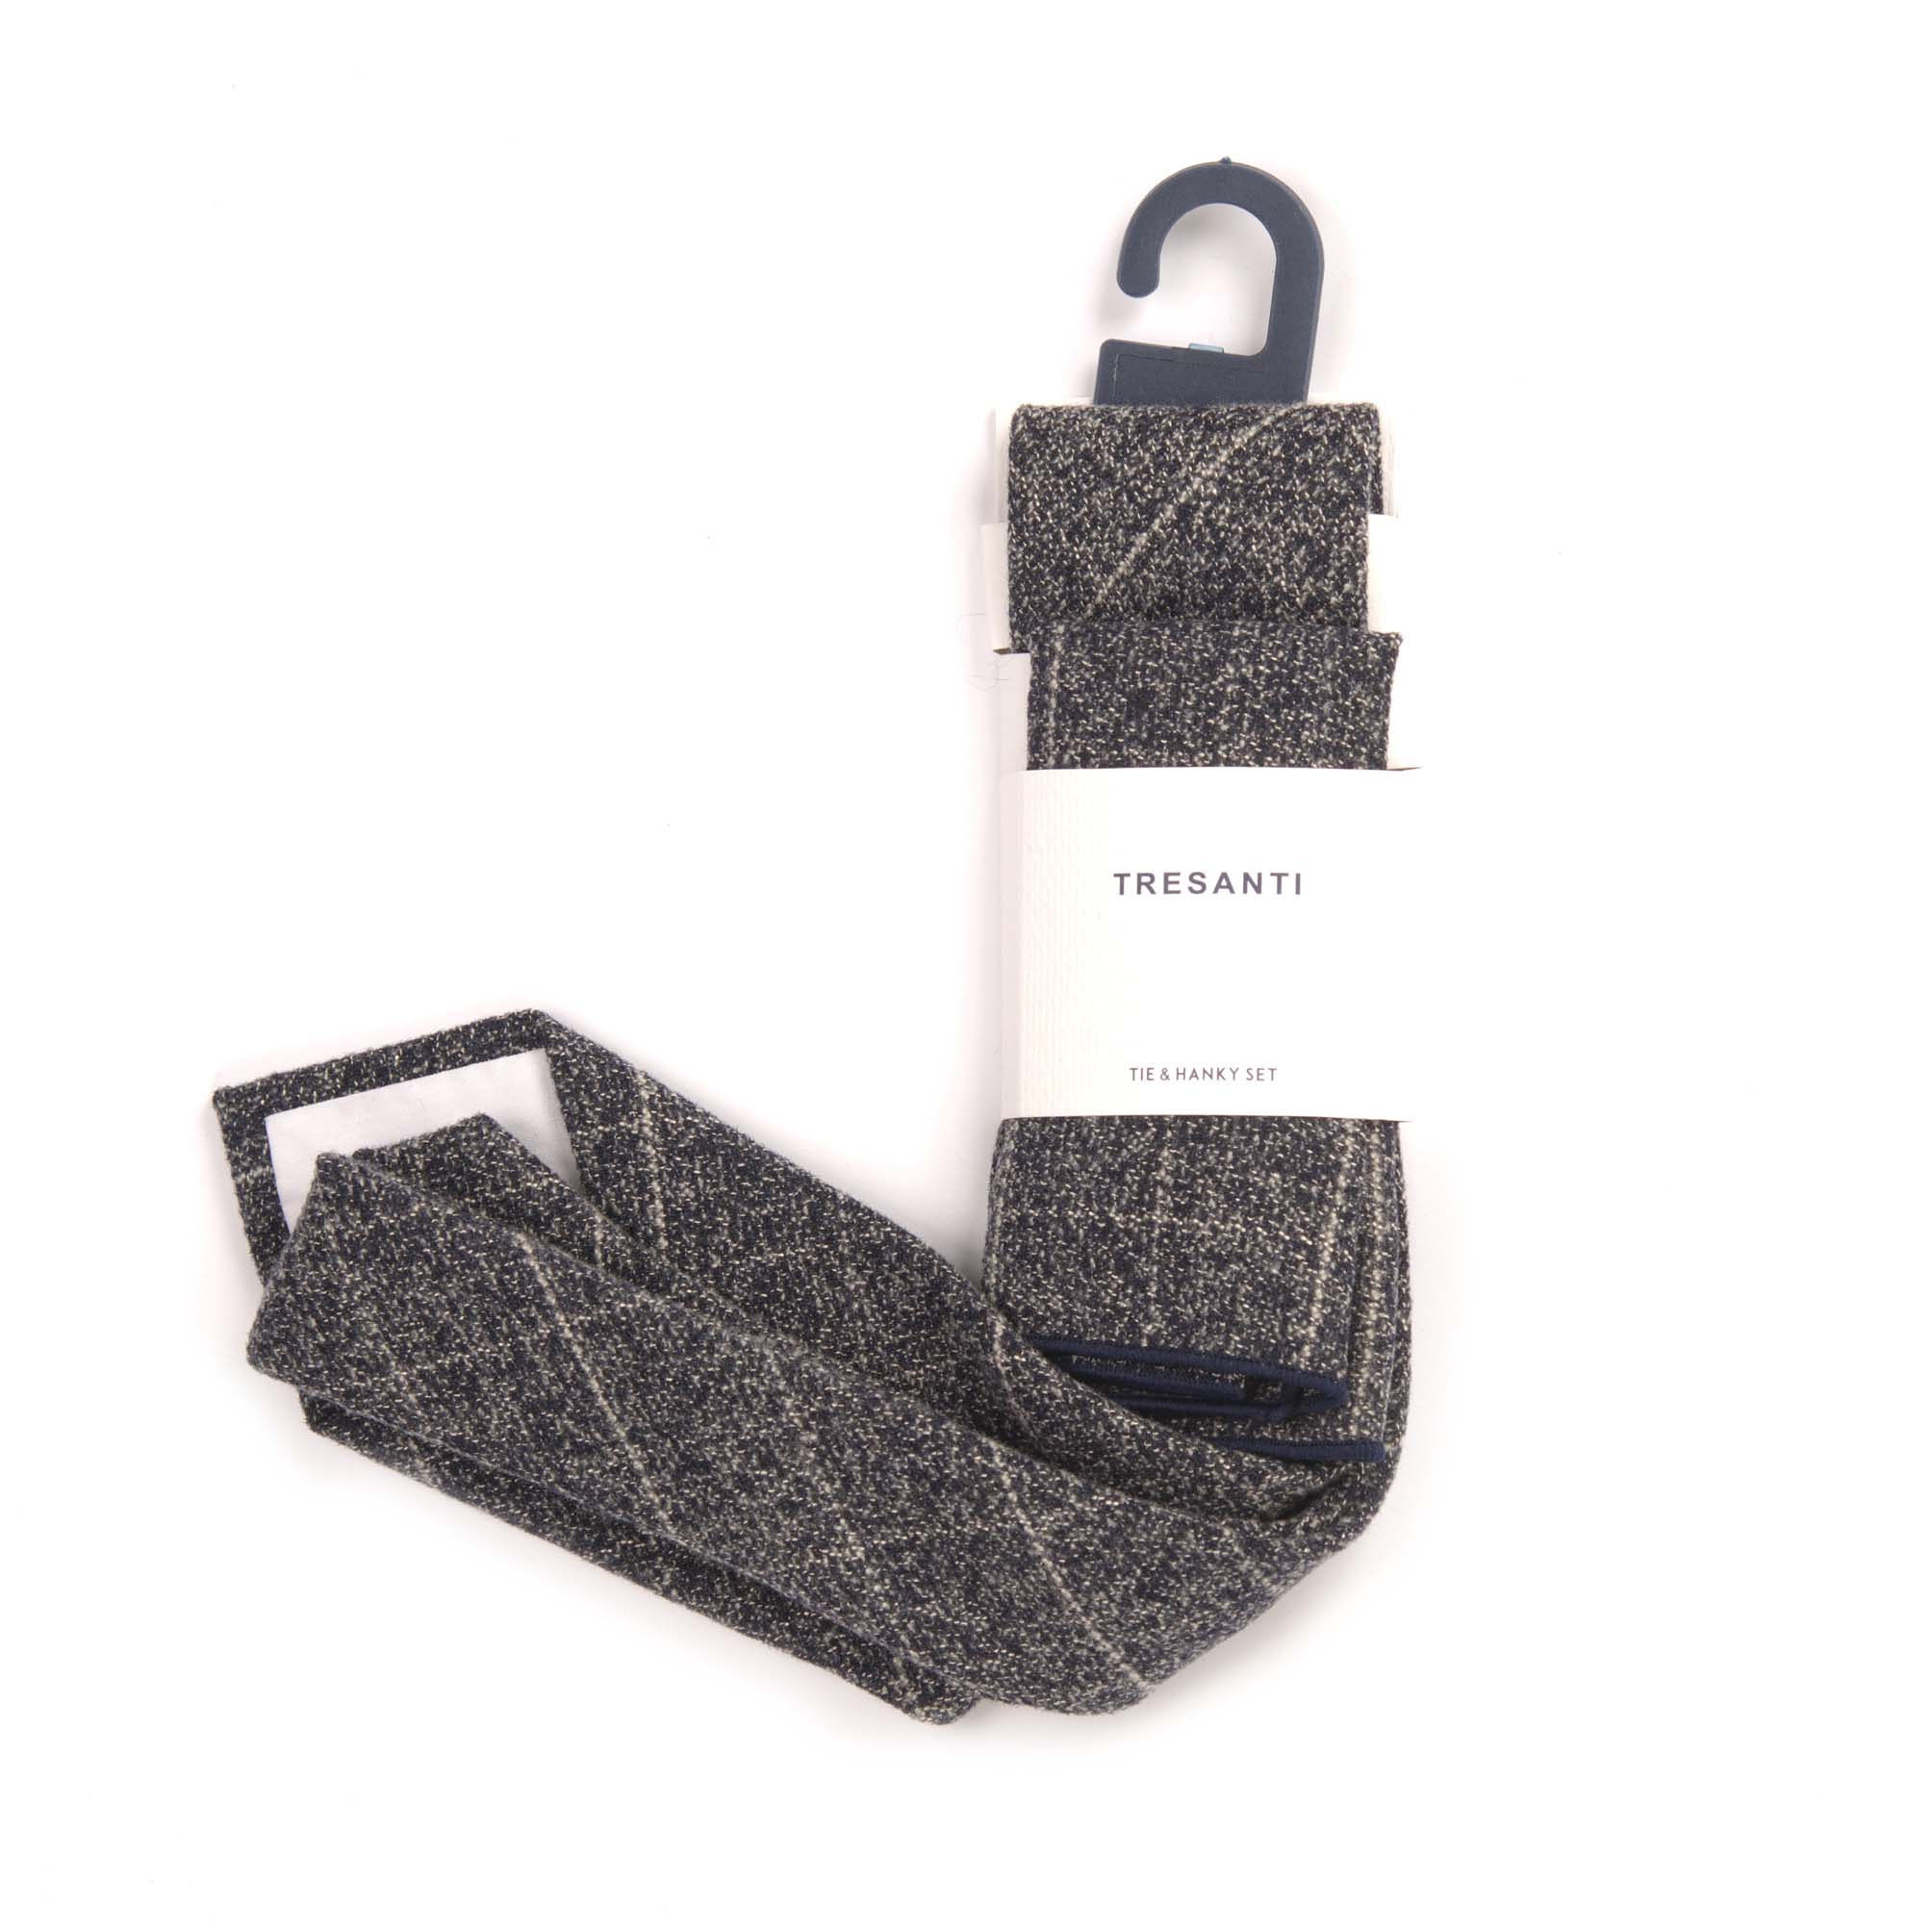 Tie & hanky set grey